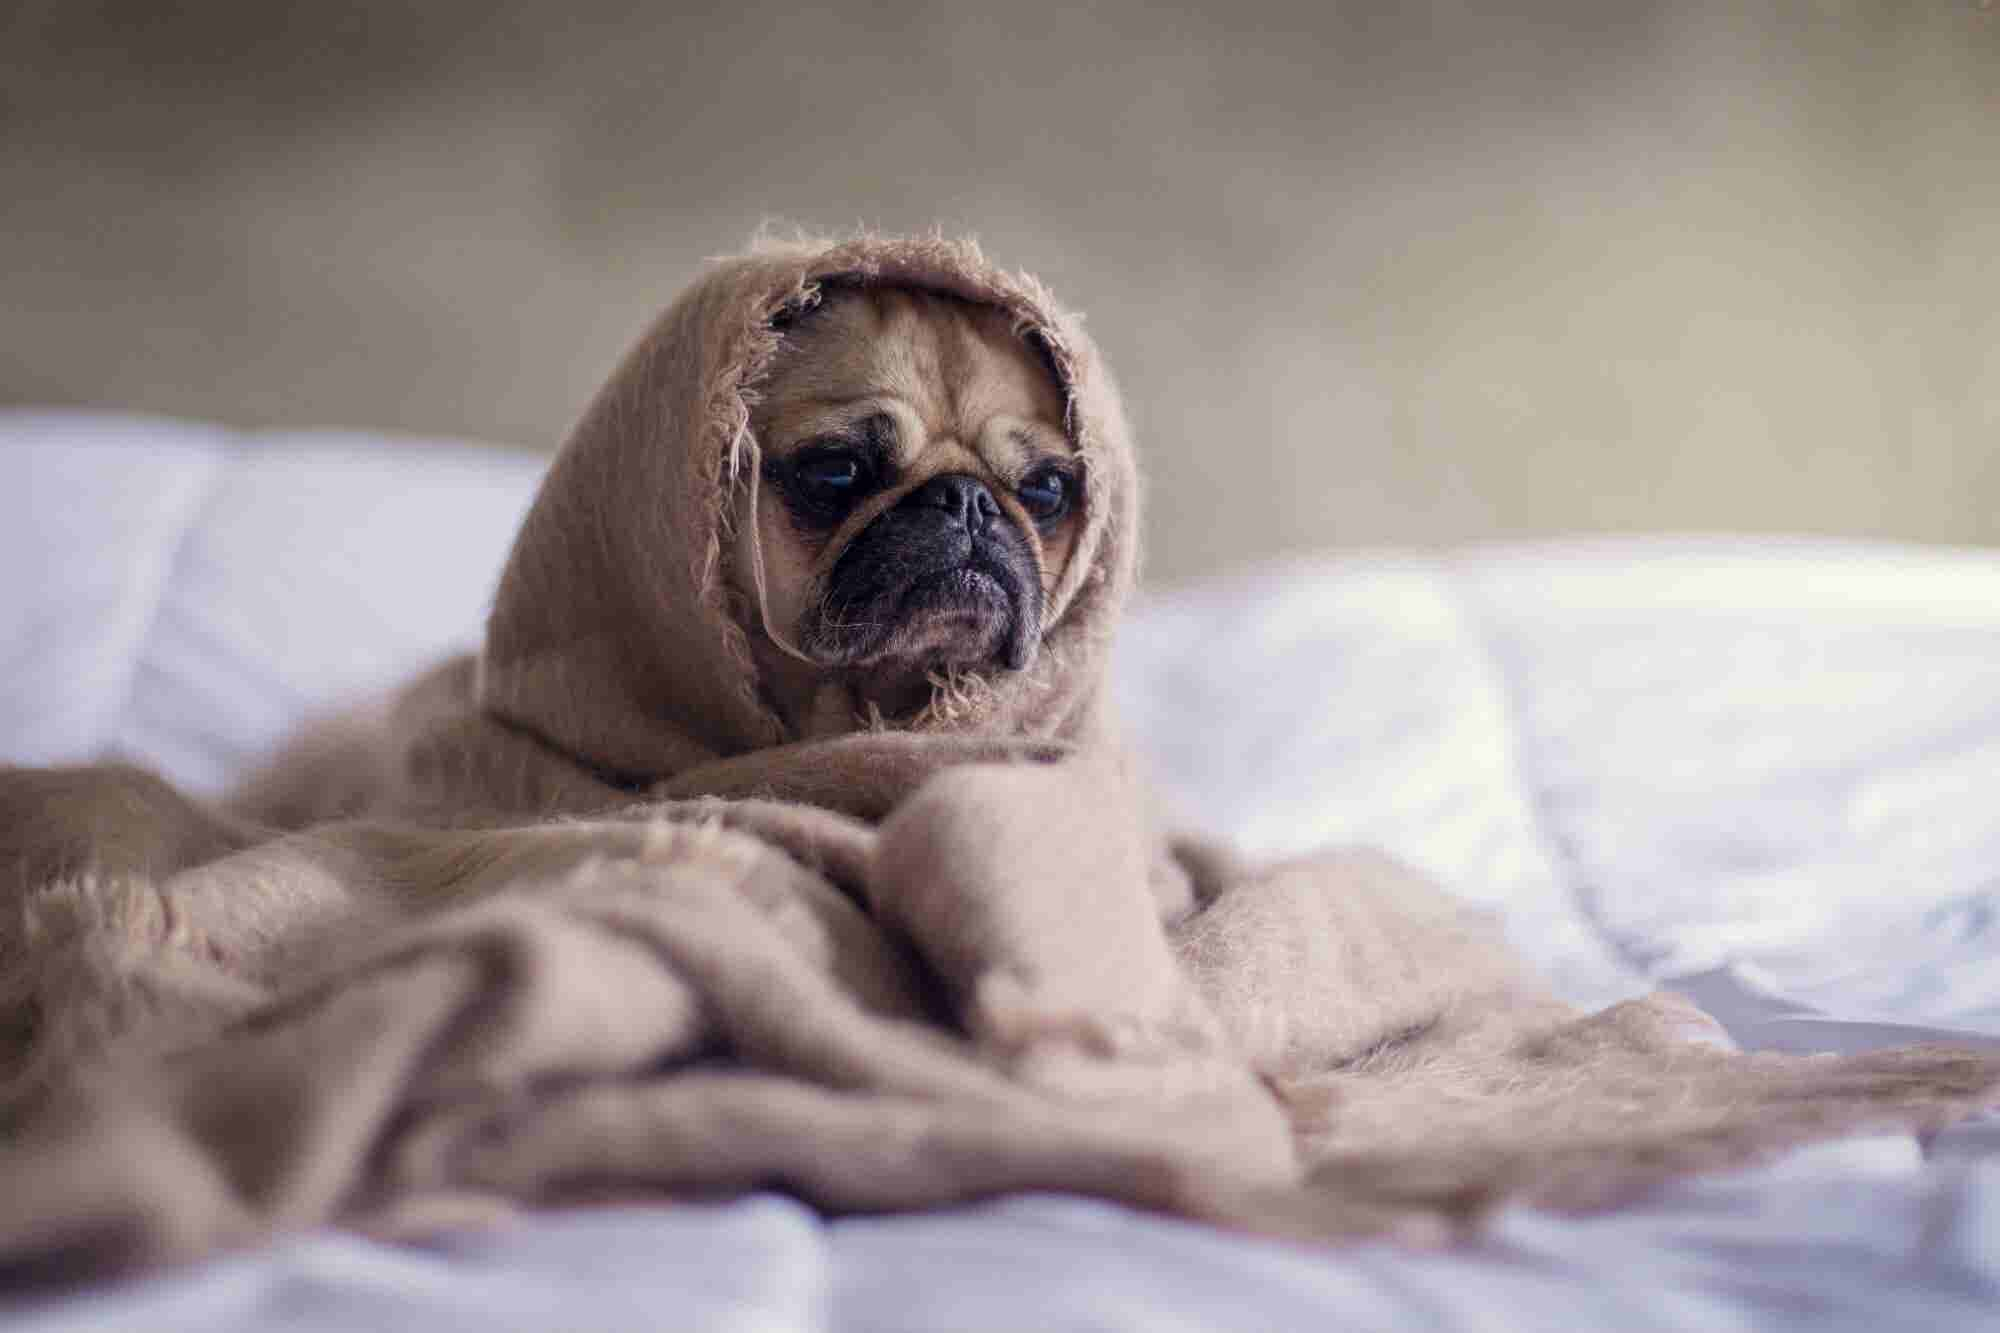 5 formas de ser productivo antes de pararte de tu cama (aunque no quie...